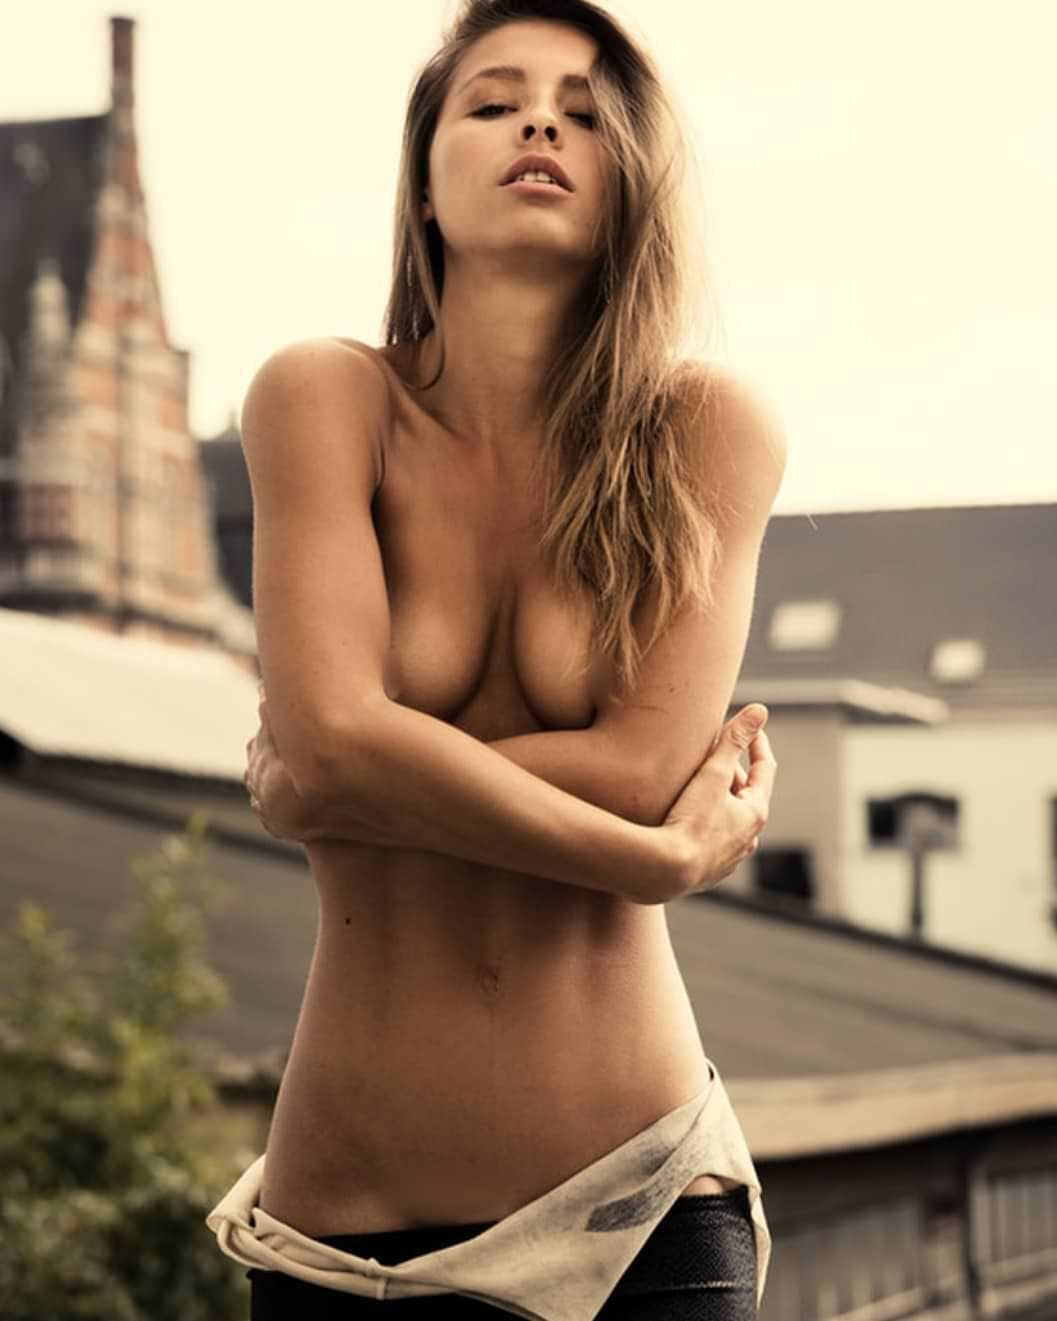 Snapchat Marisa Papen nude photos 2019